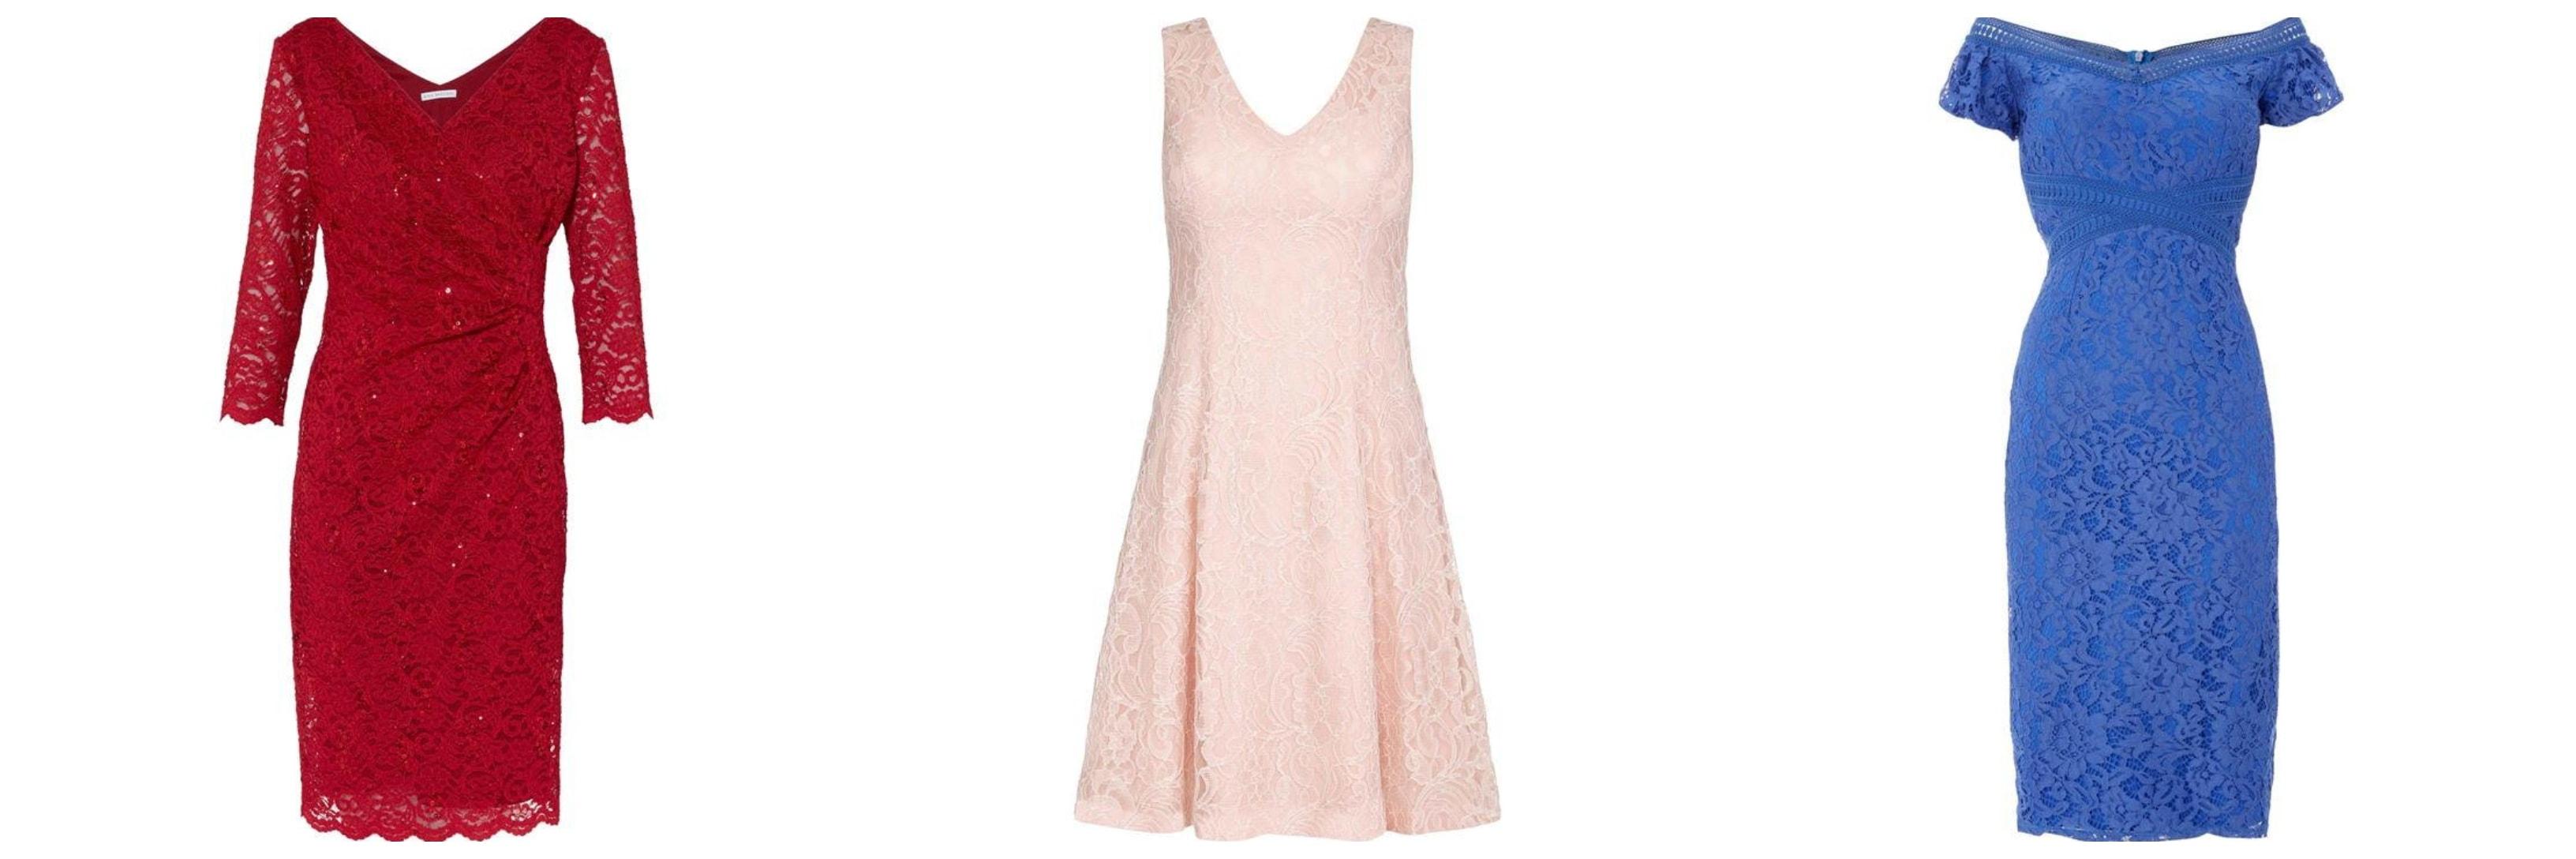 Cunard Dress Code Examples Lace Dress